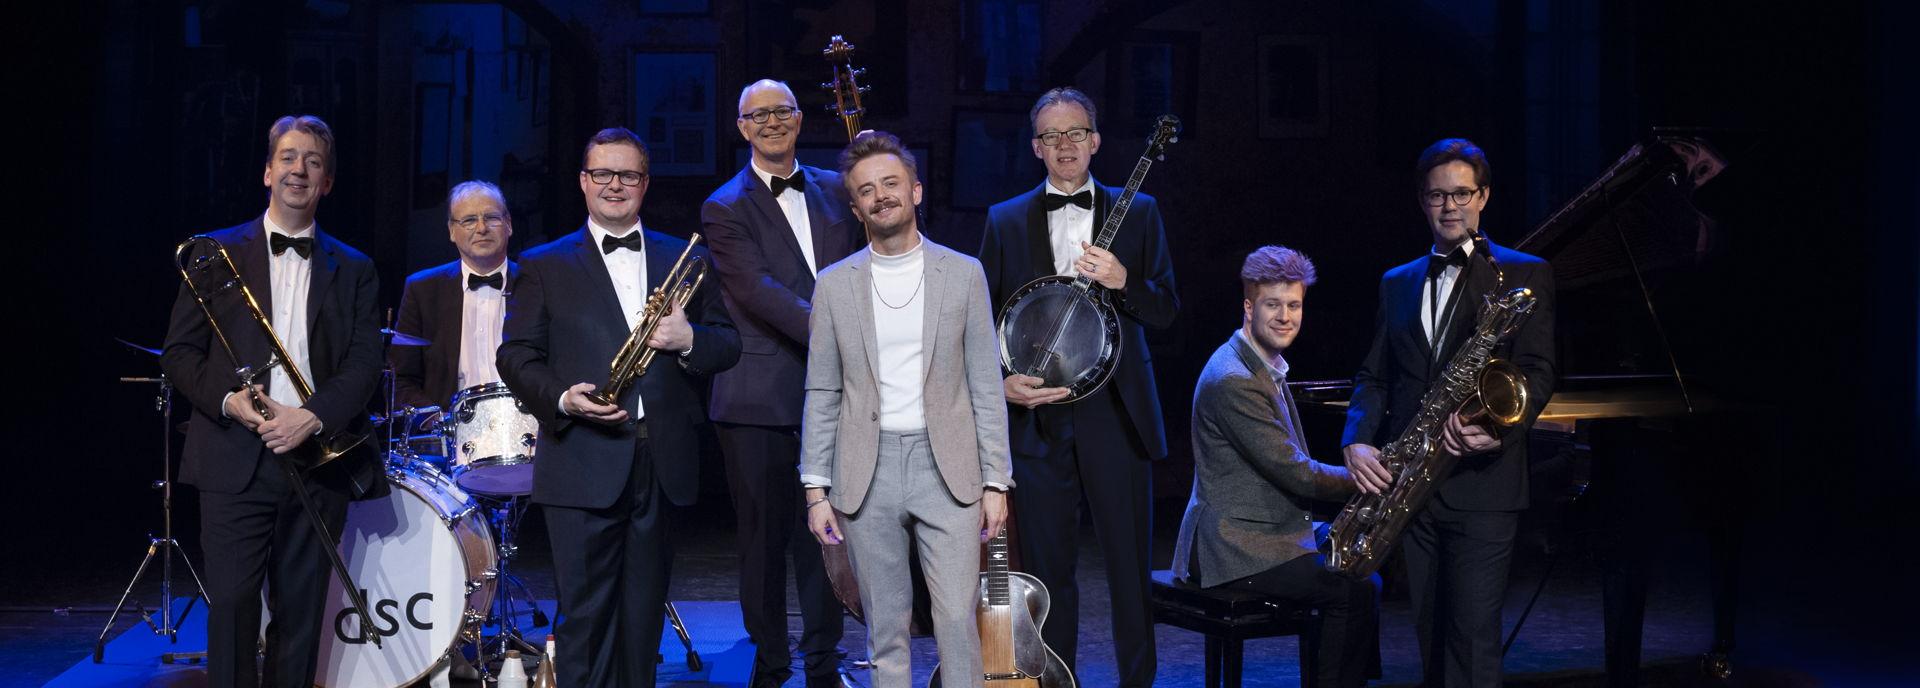 Wouter Hamel en Dutch Swing College Band